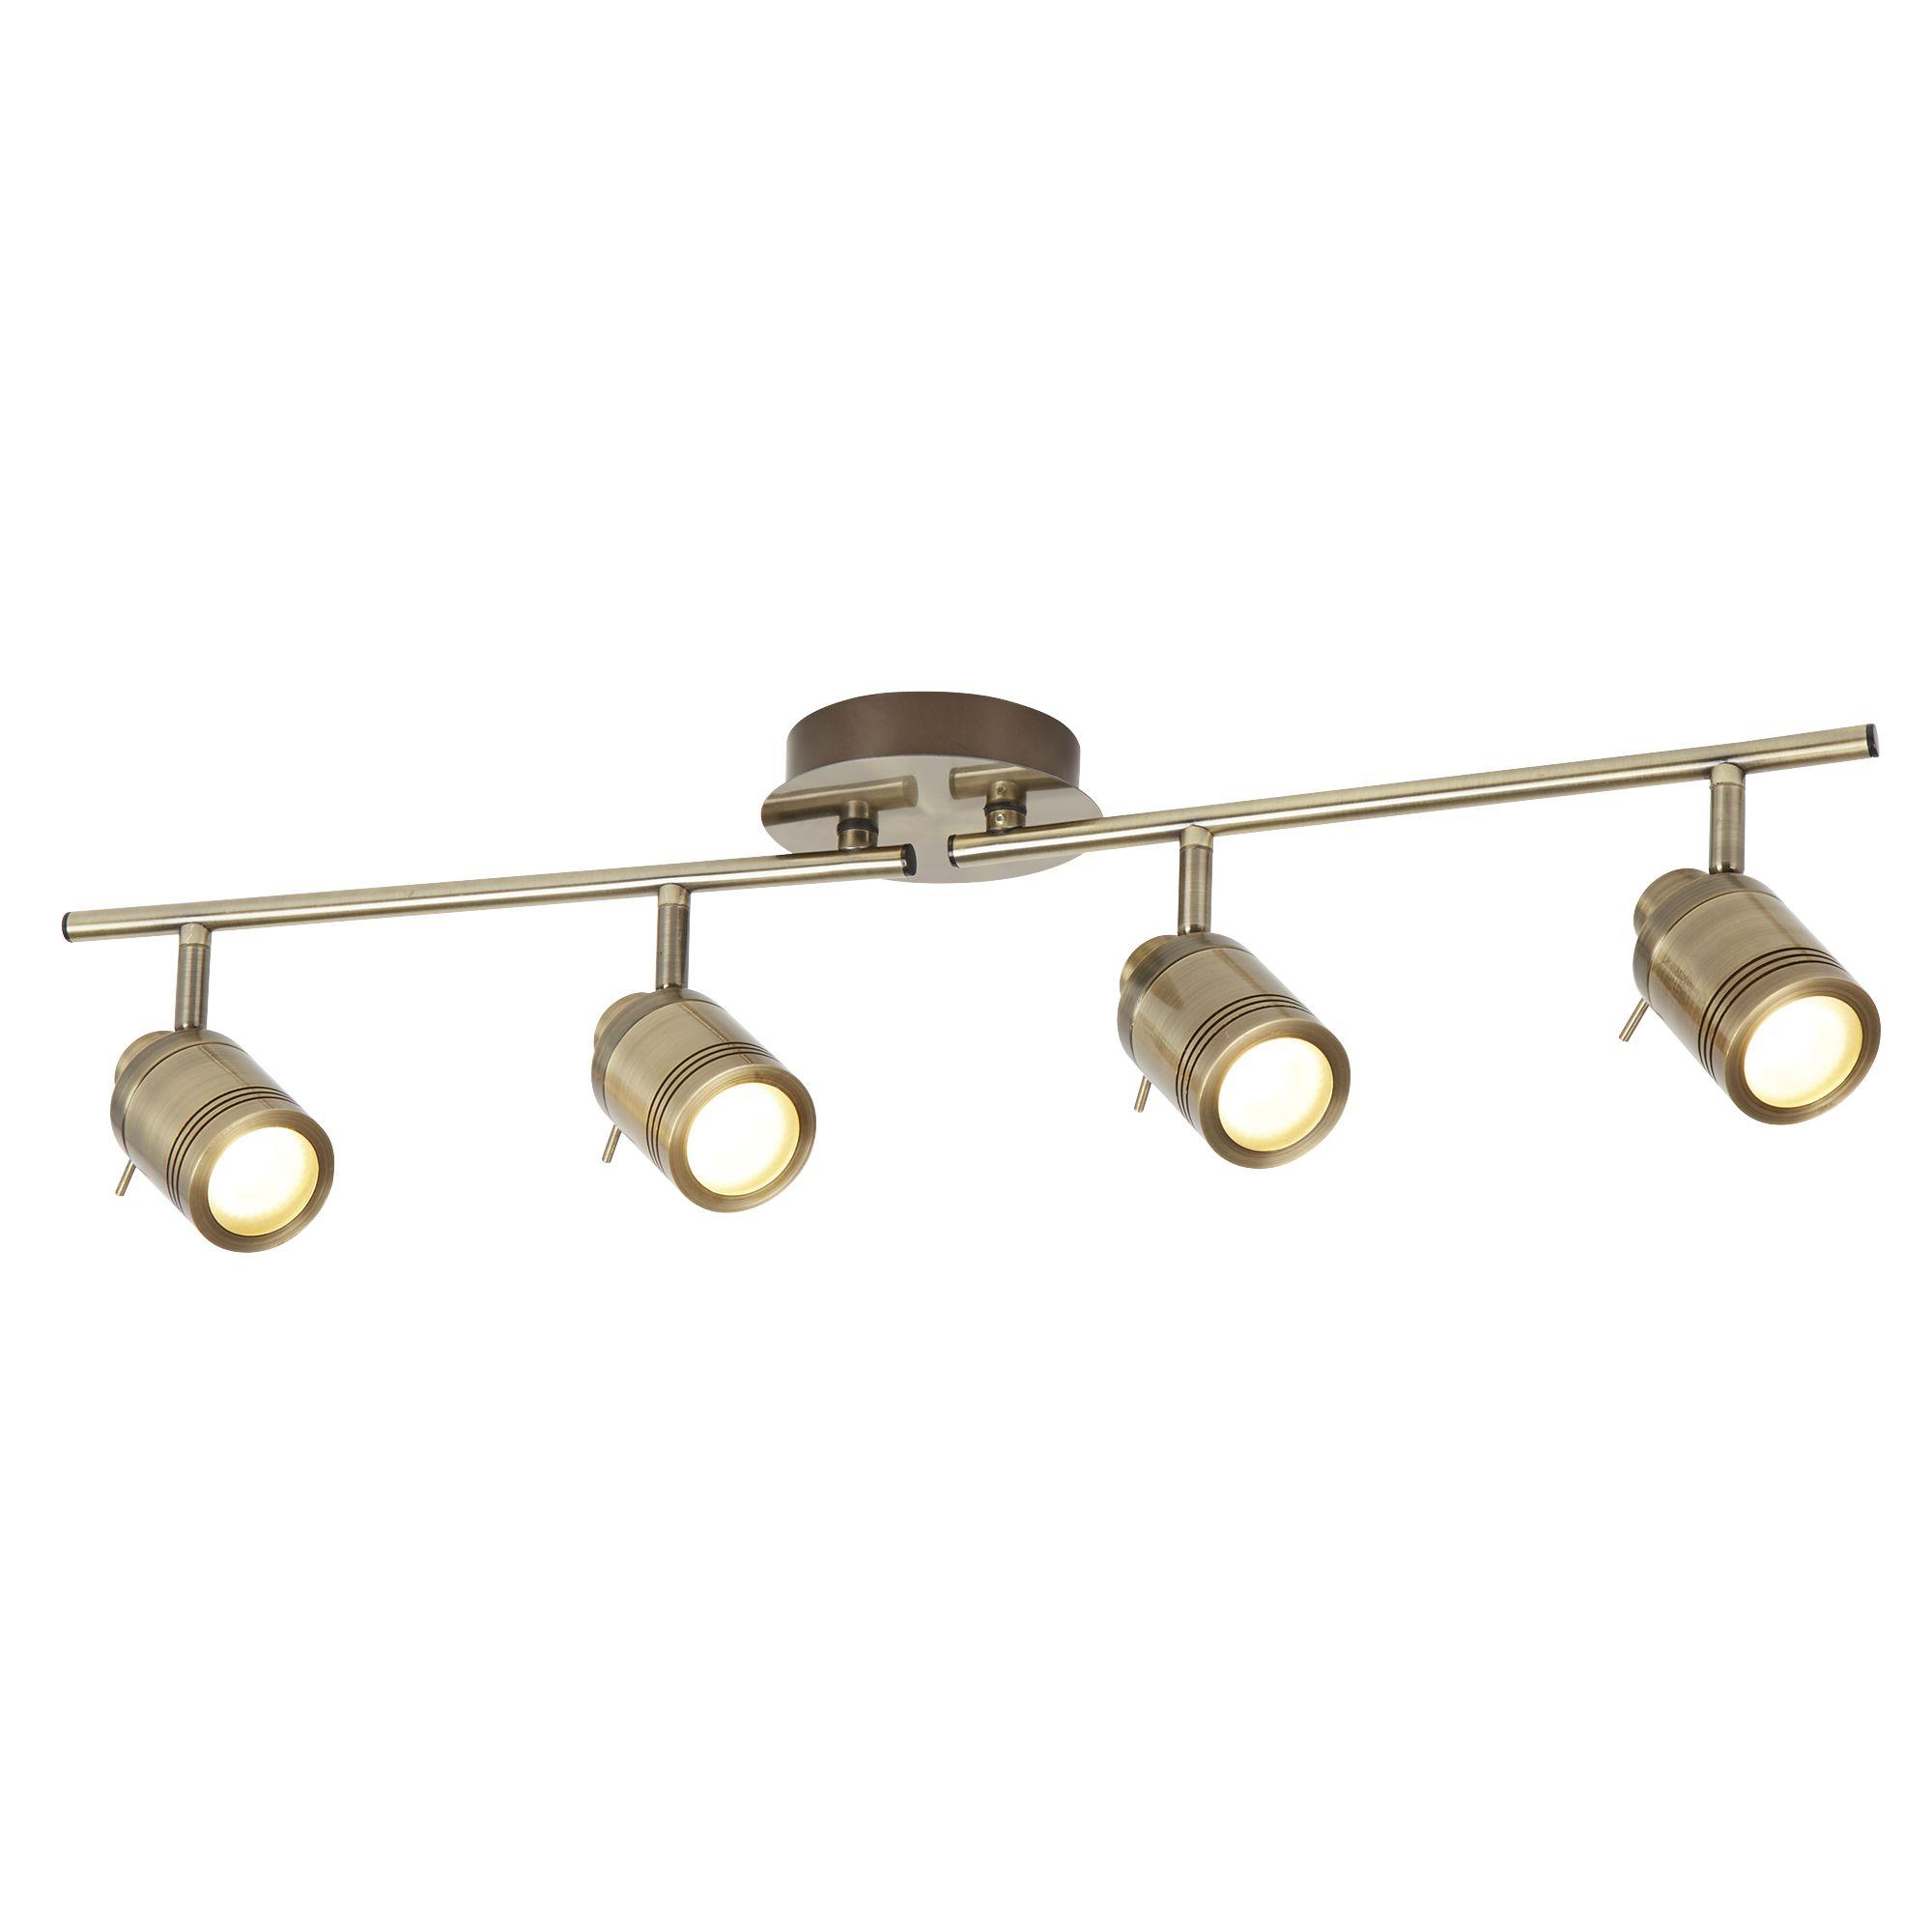 Antique Brass, 4 Light Ip44 Bathroom Spot Split-bar, Adjustable Heads